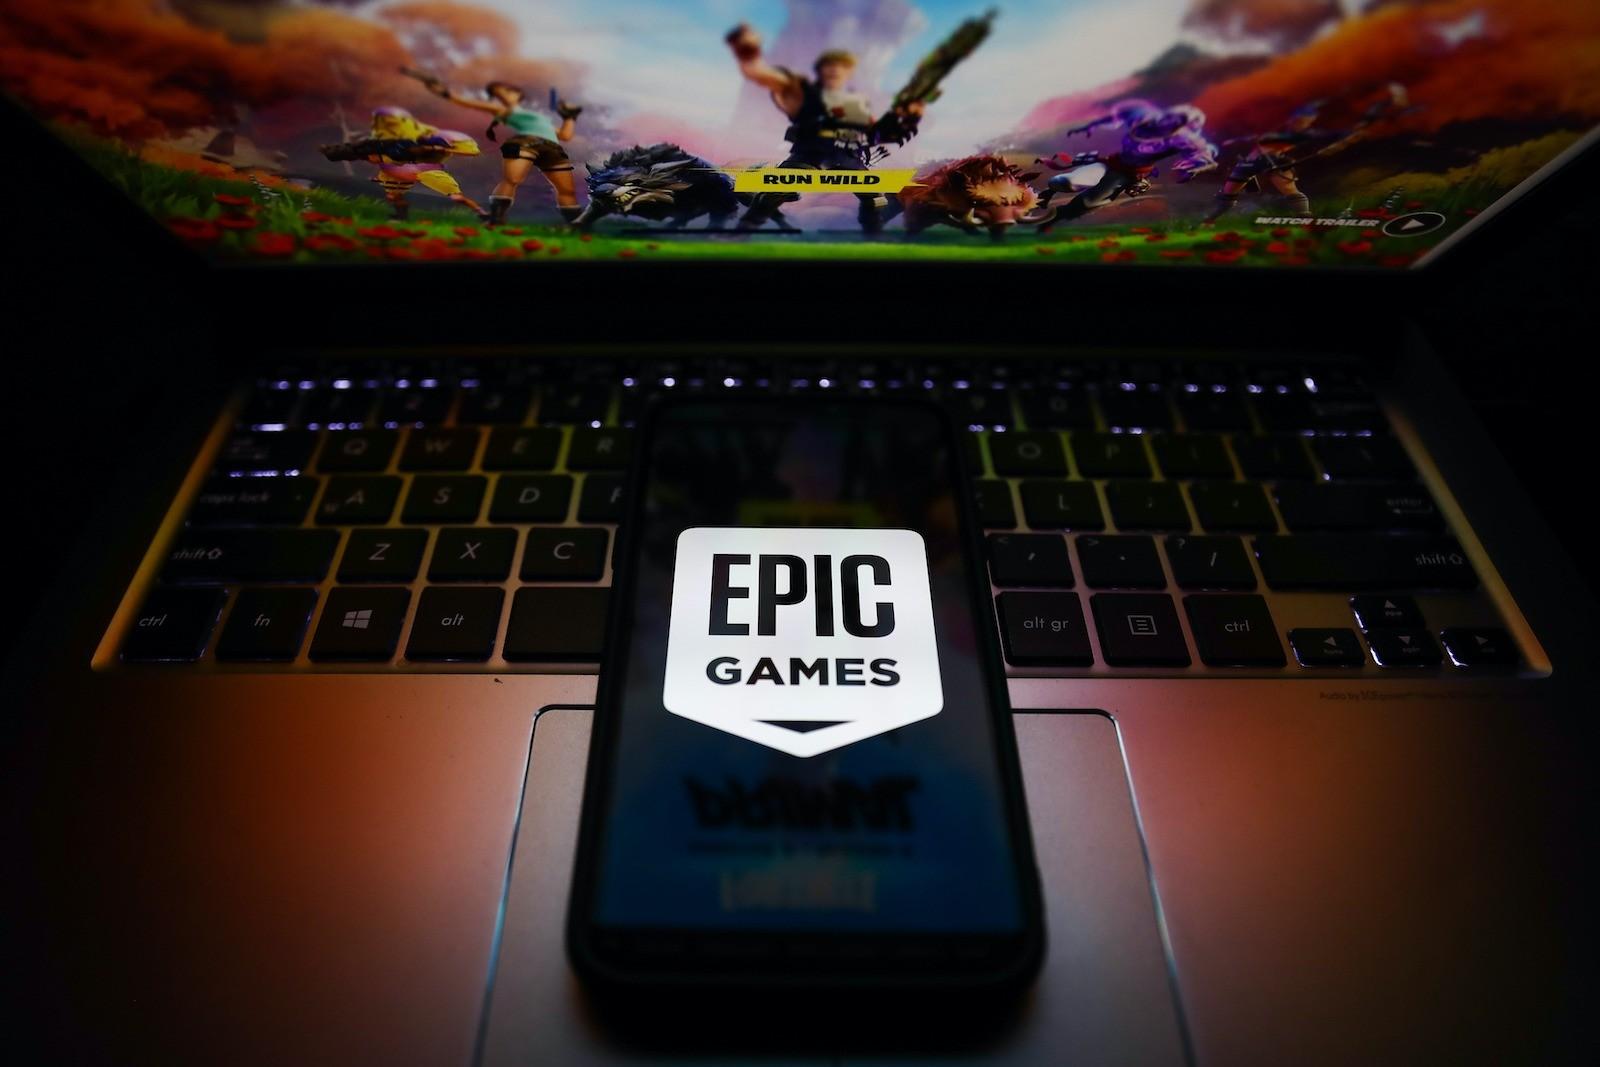 Epic针对App Store垄断案的第一轮判决进行上诉插图1